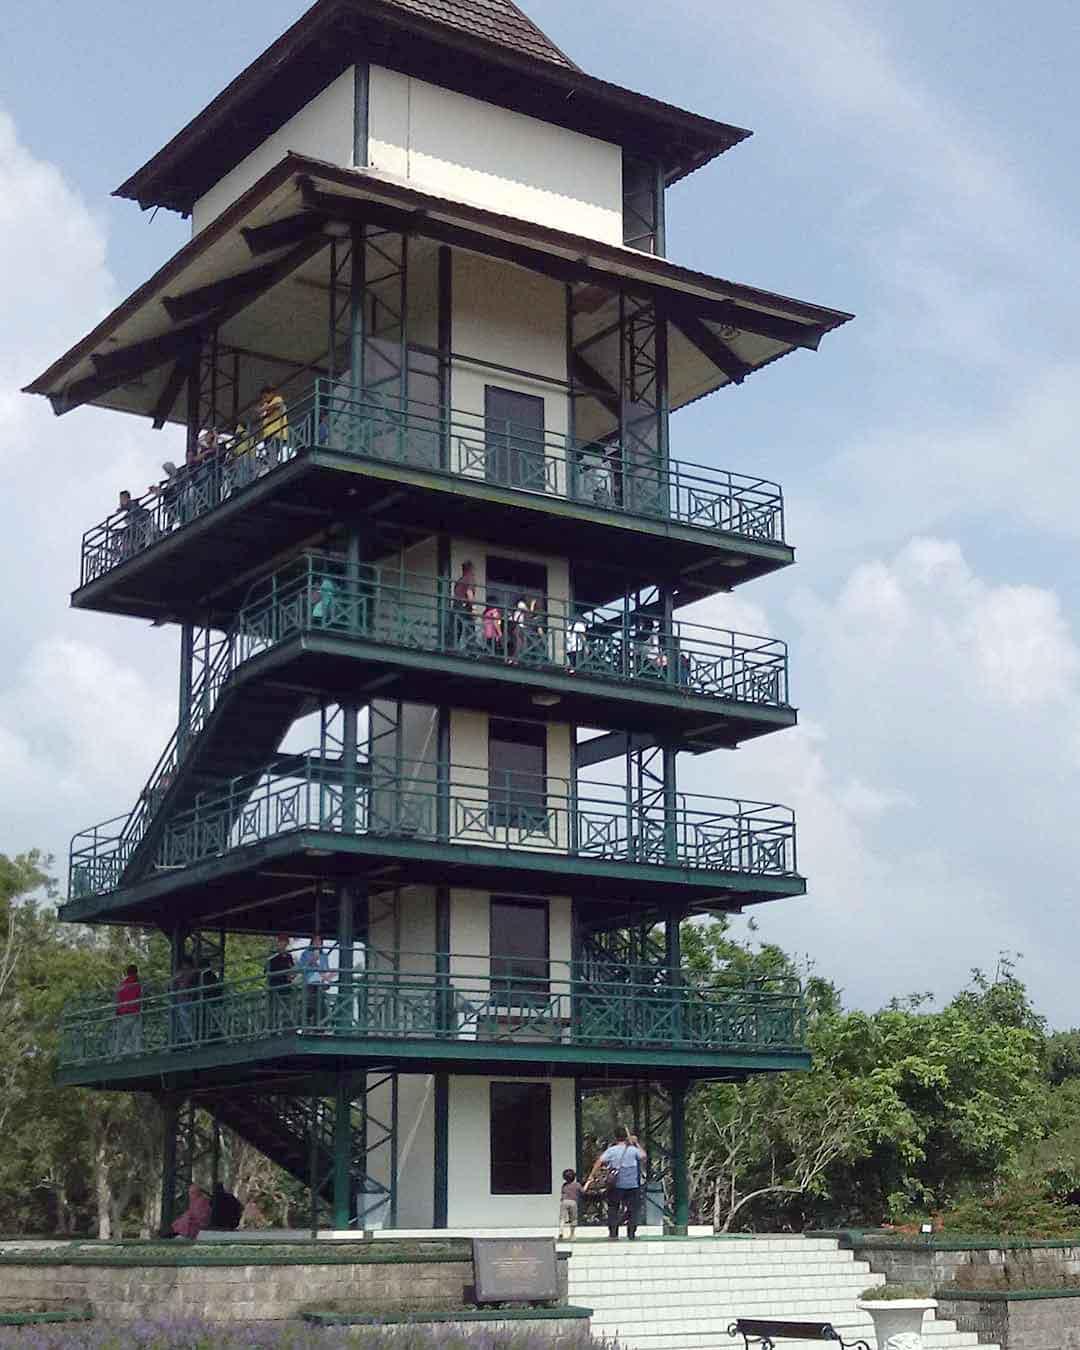 Menara Pandang di Taman Bunga Nusantara Image From @erghabule